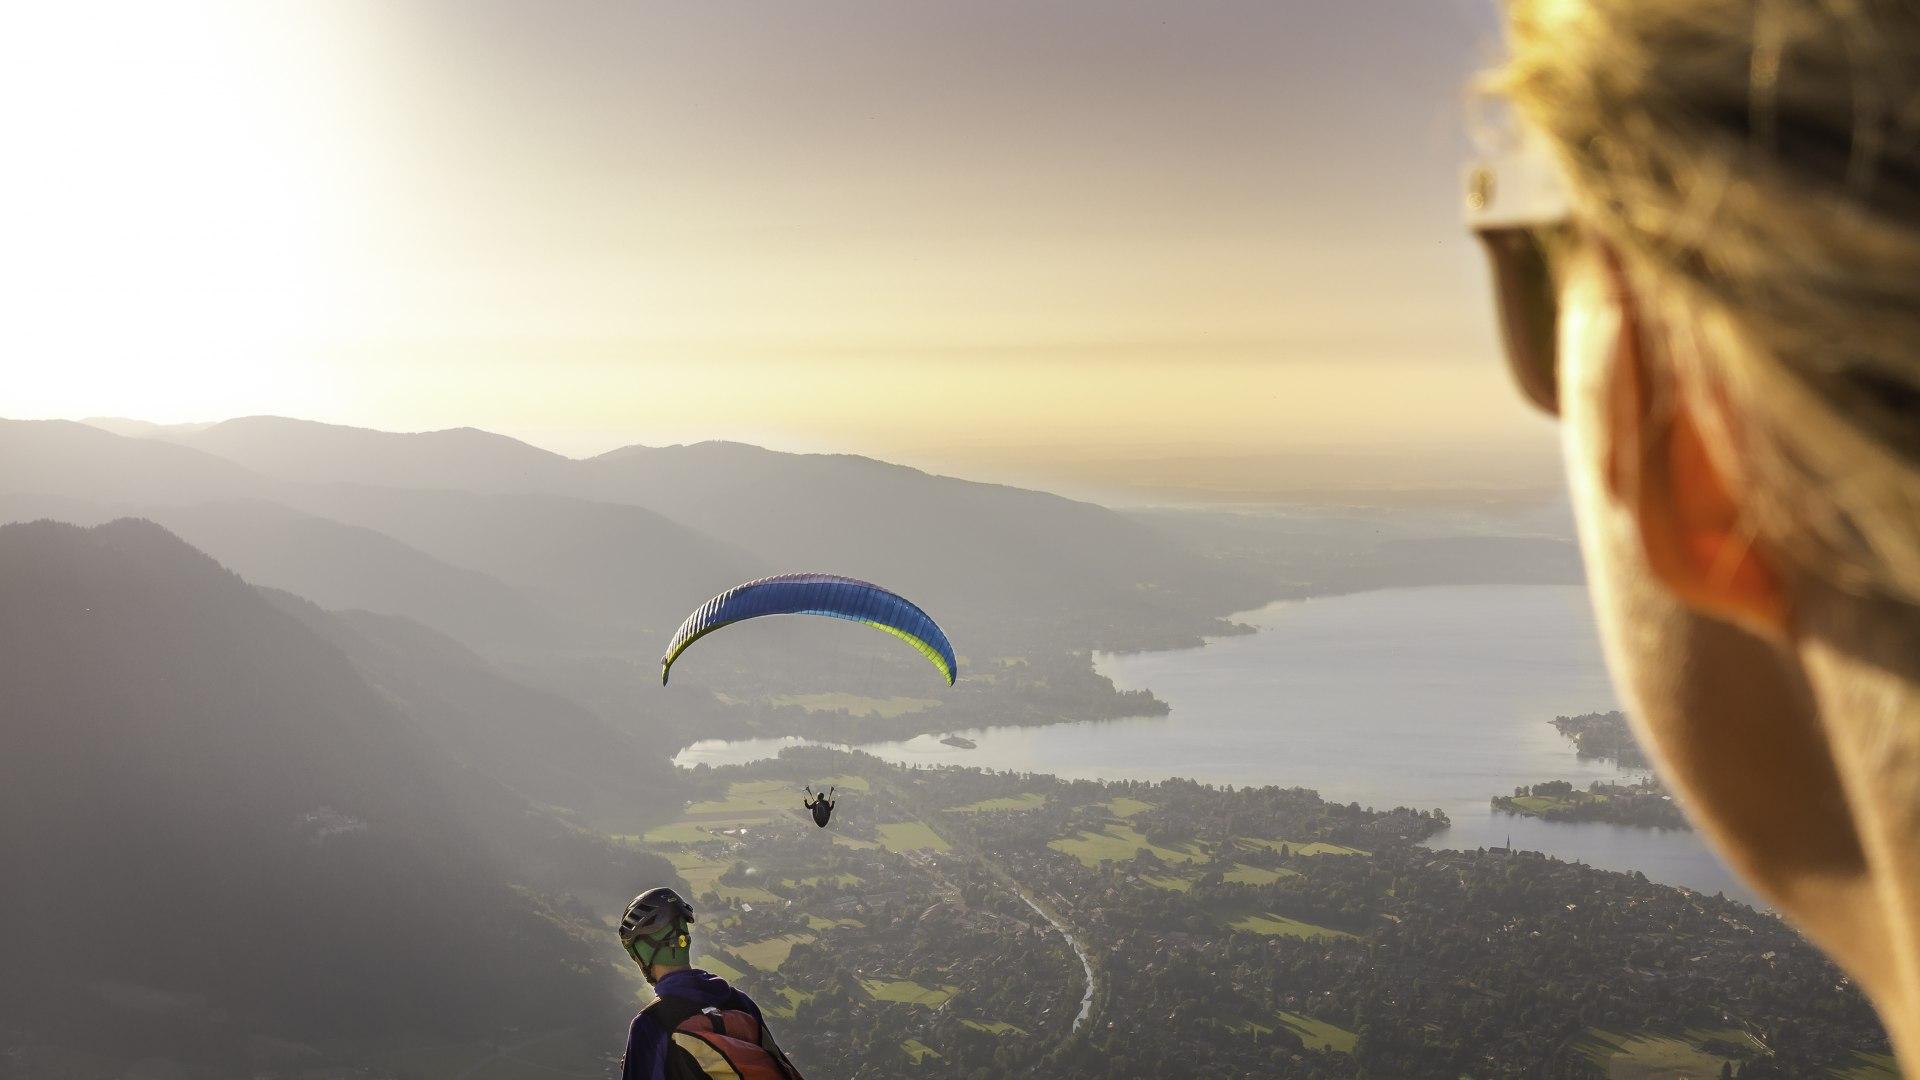 View from paragliding, © Der Tegernsee, Dietmar Denger